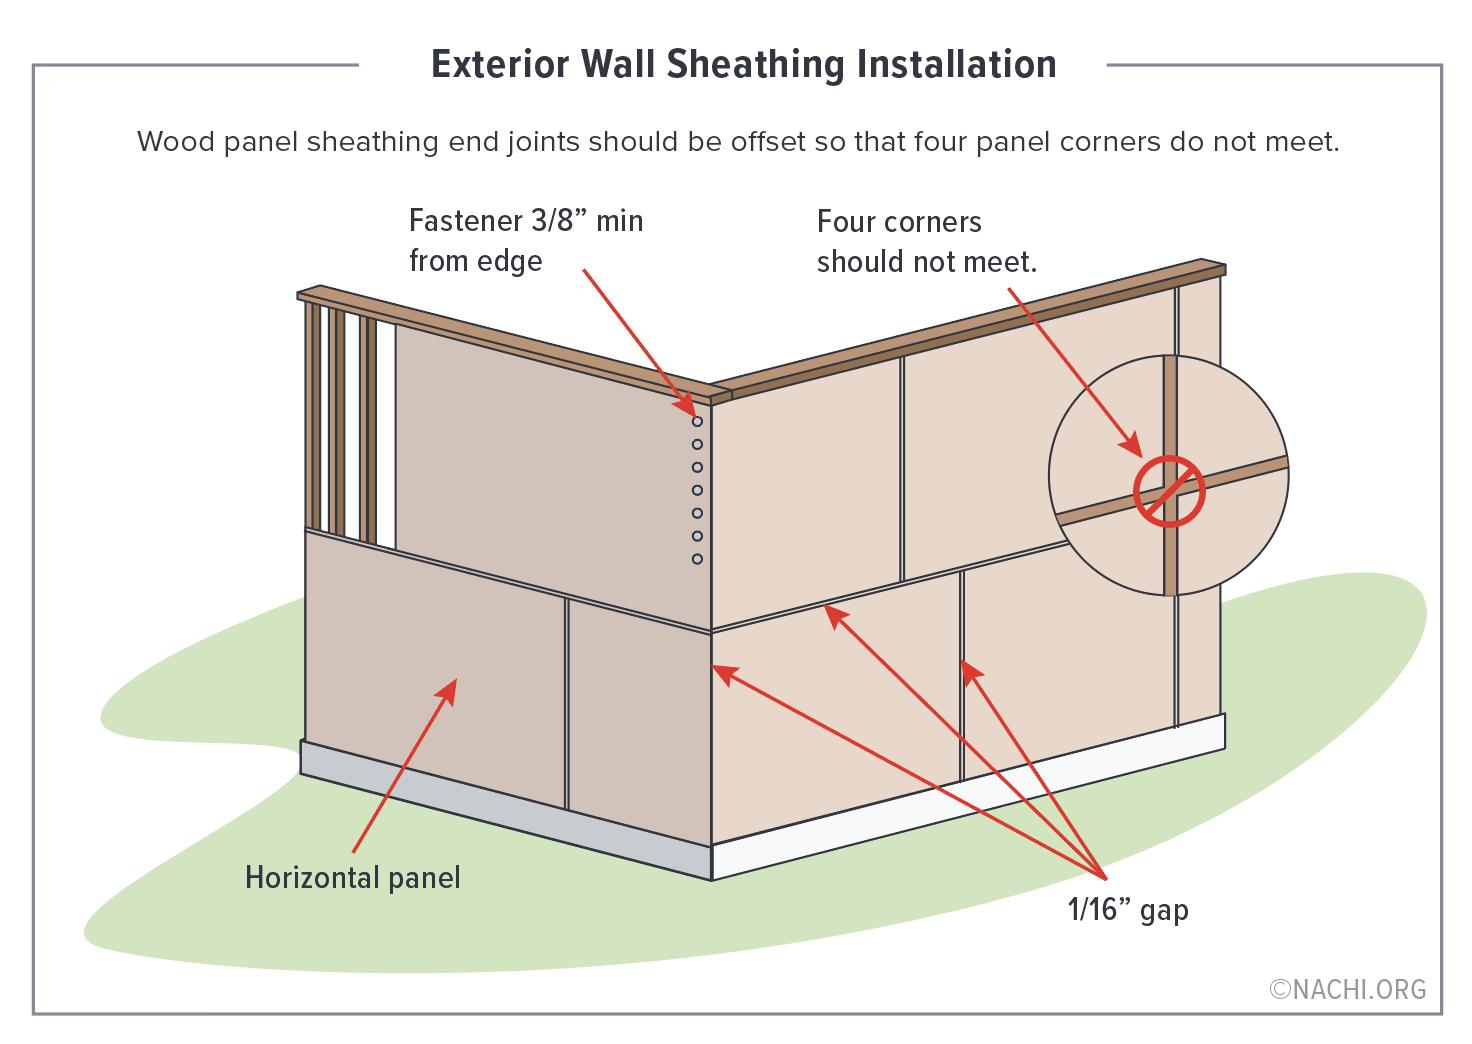 Exterior Sheathing Installation.